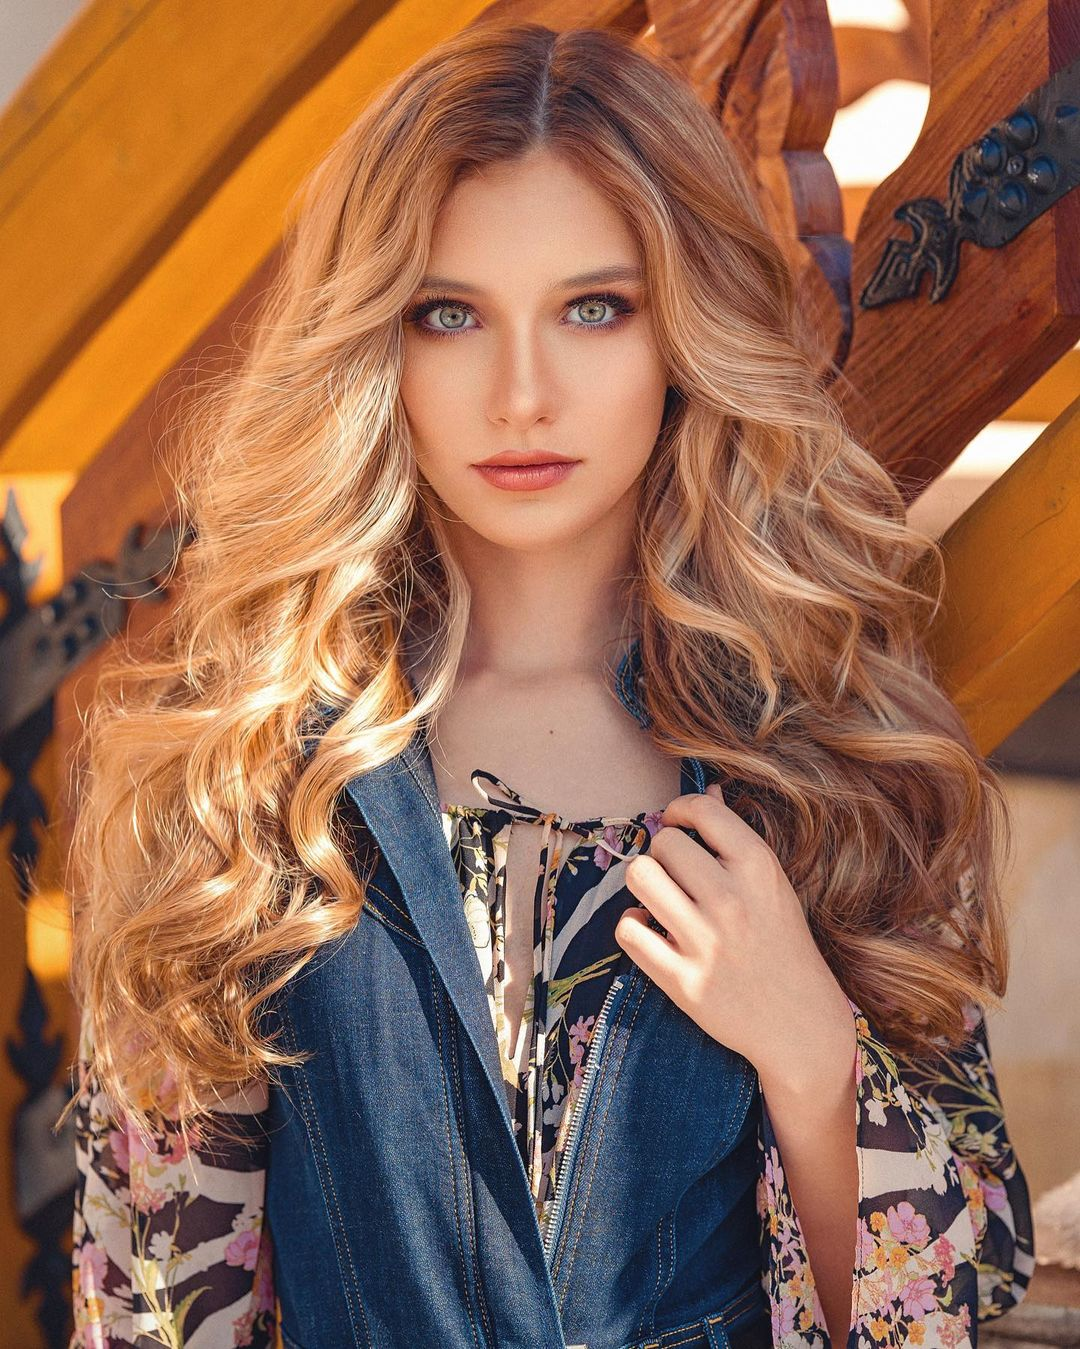 Alexandra-Lenarchyk-Wallpapers-Insta-Fit-Bio-17